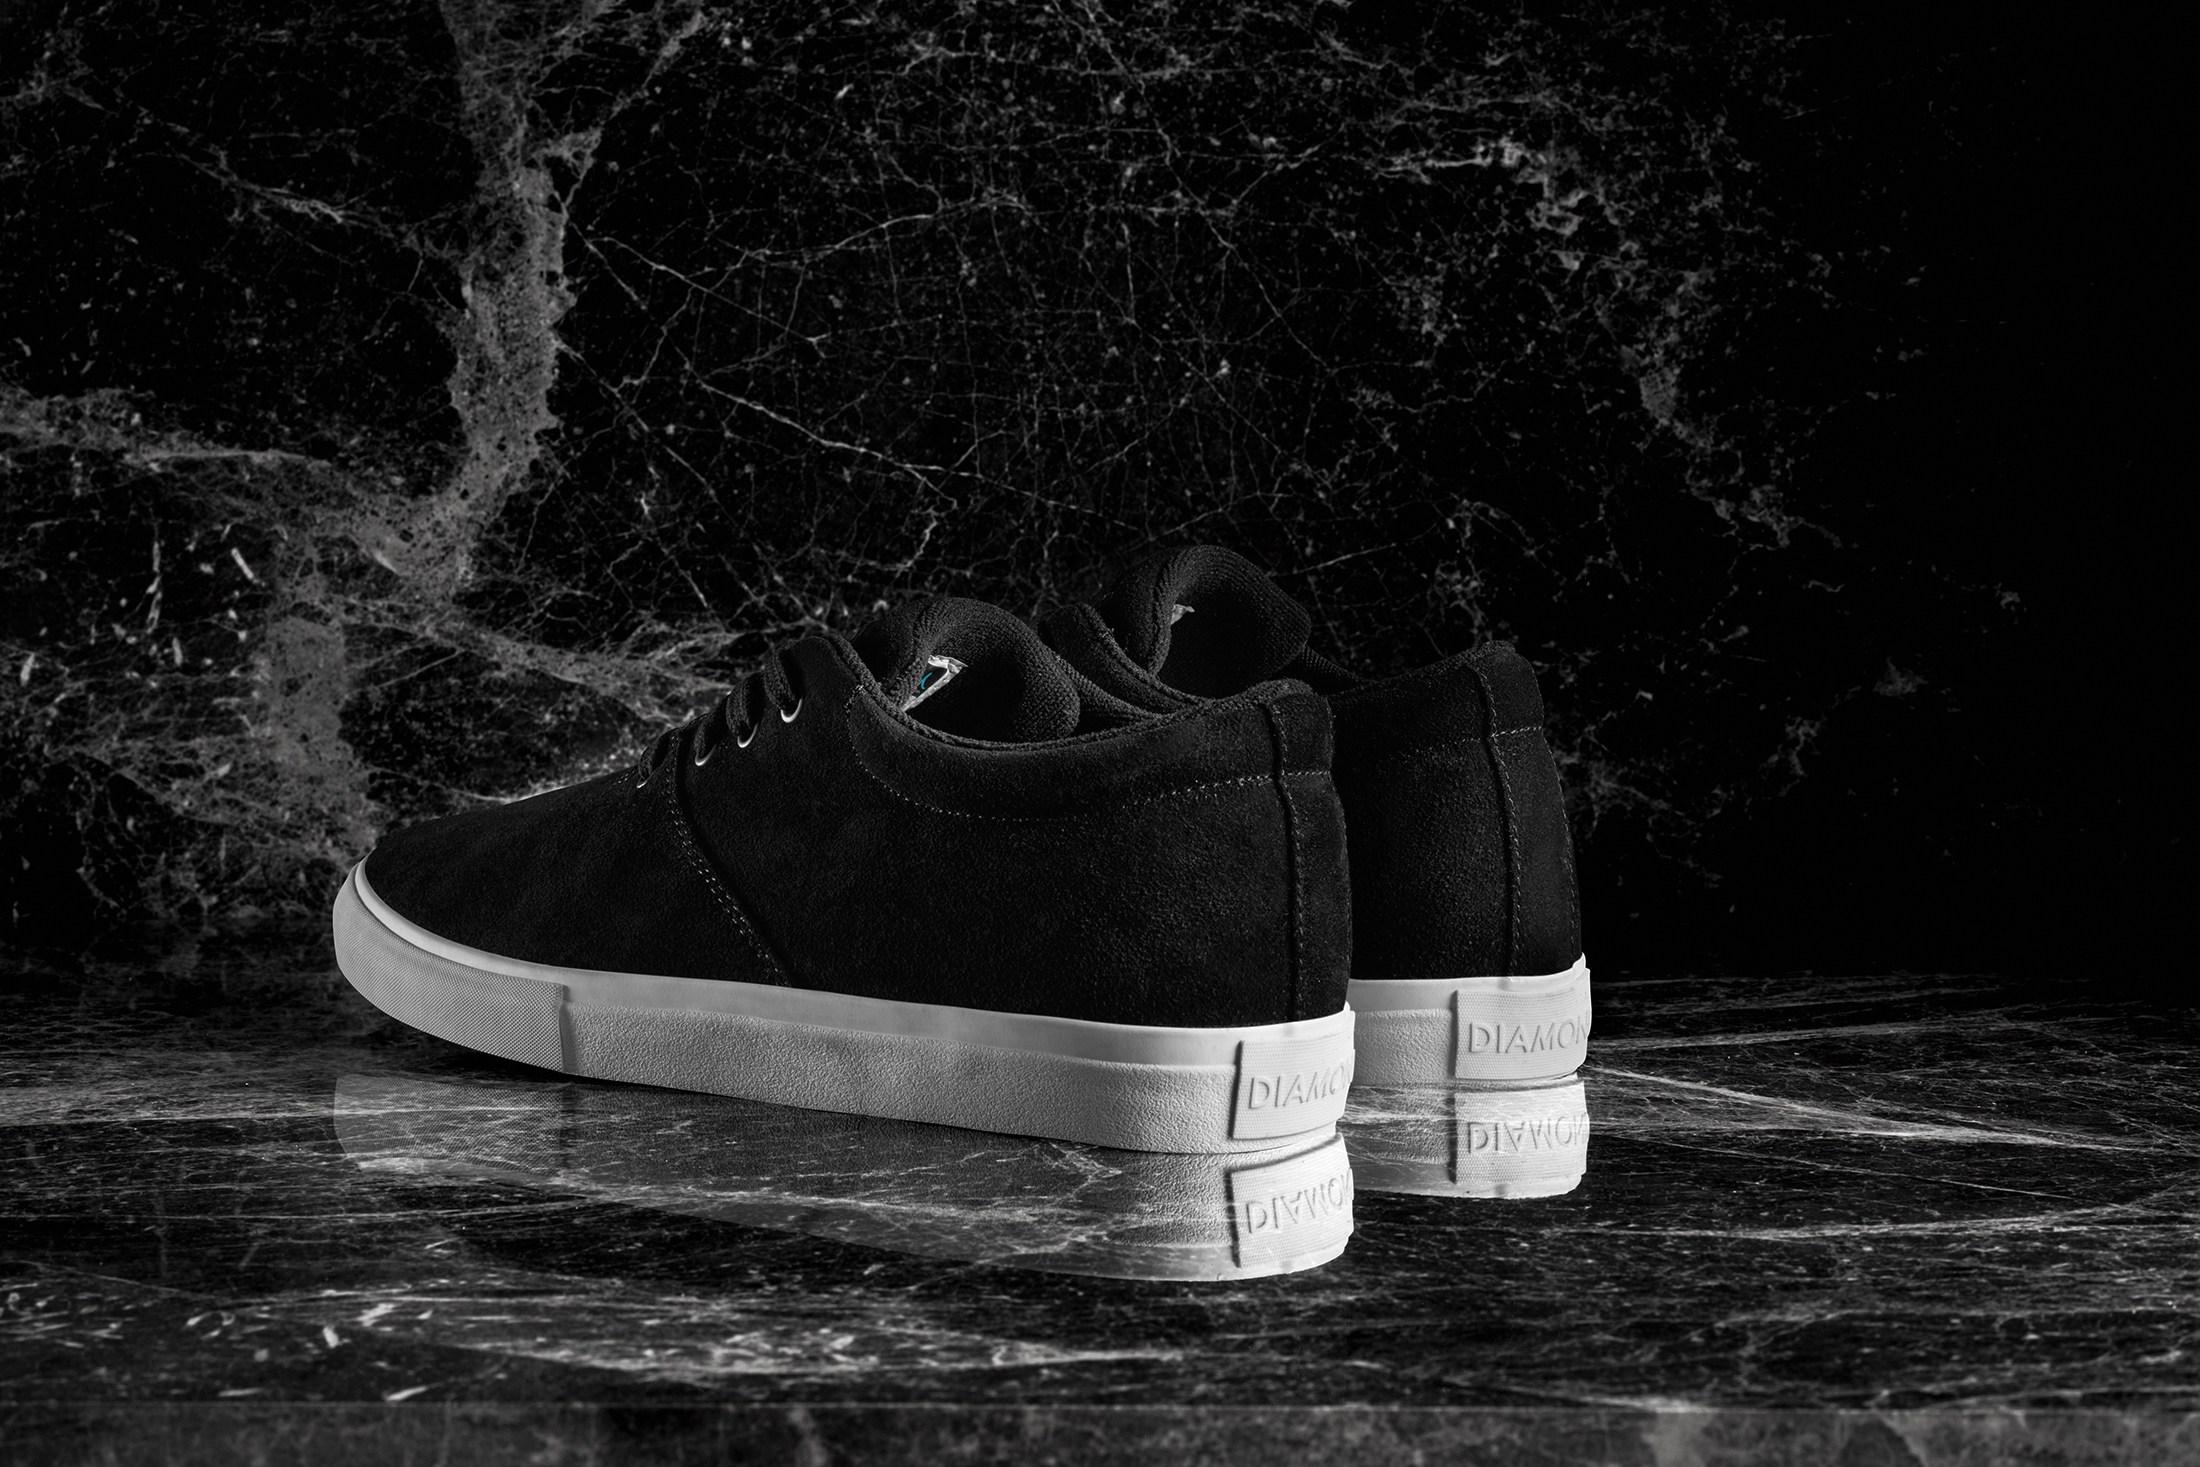 diamond-supply-co-launches-footwear-6.jpg